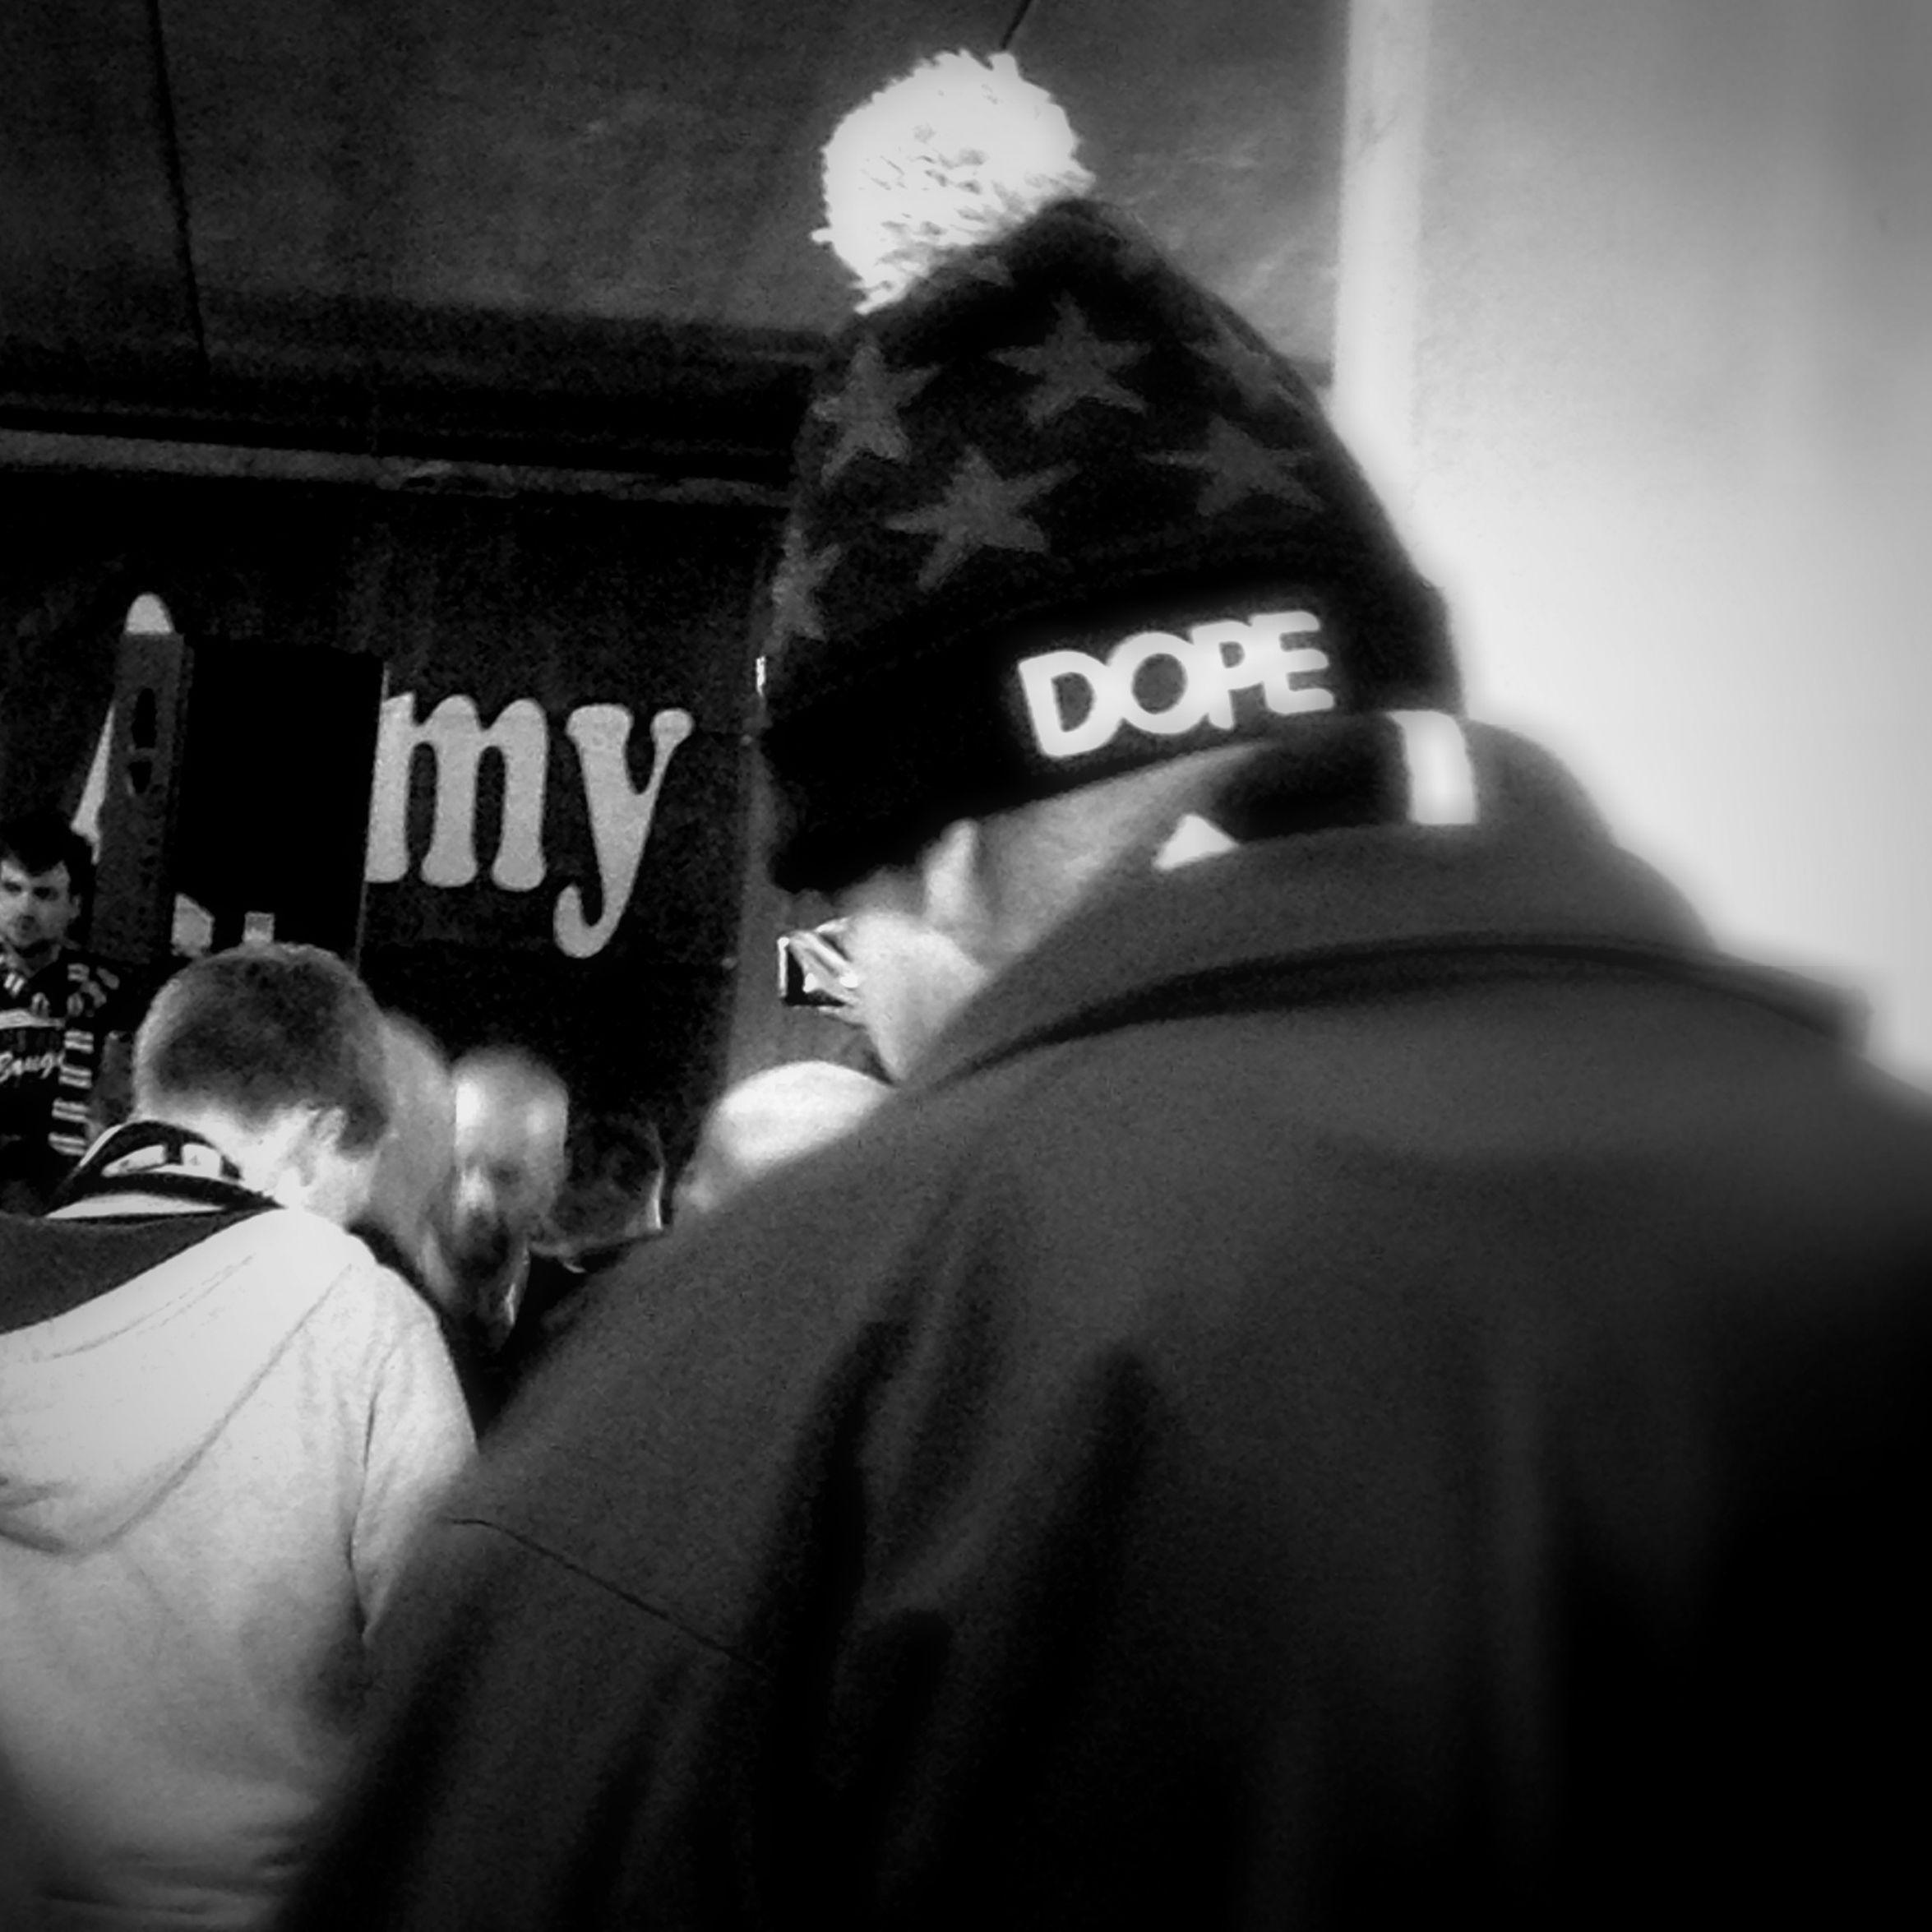 DOPE Monochrome Streetphotography Fashion